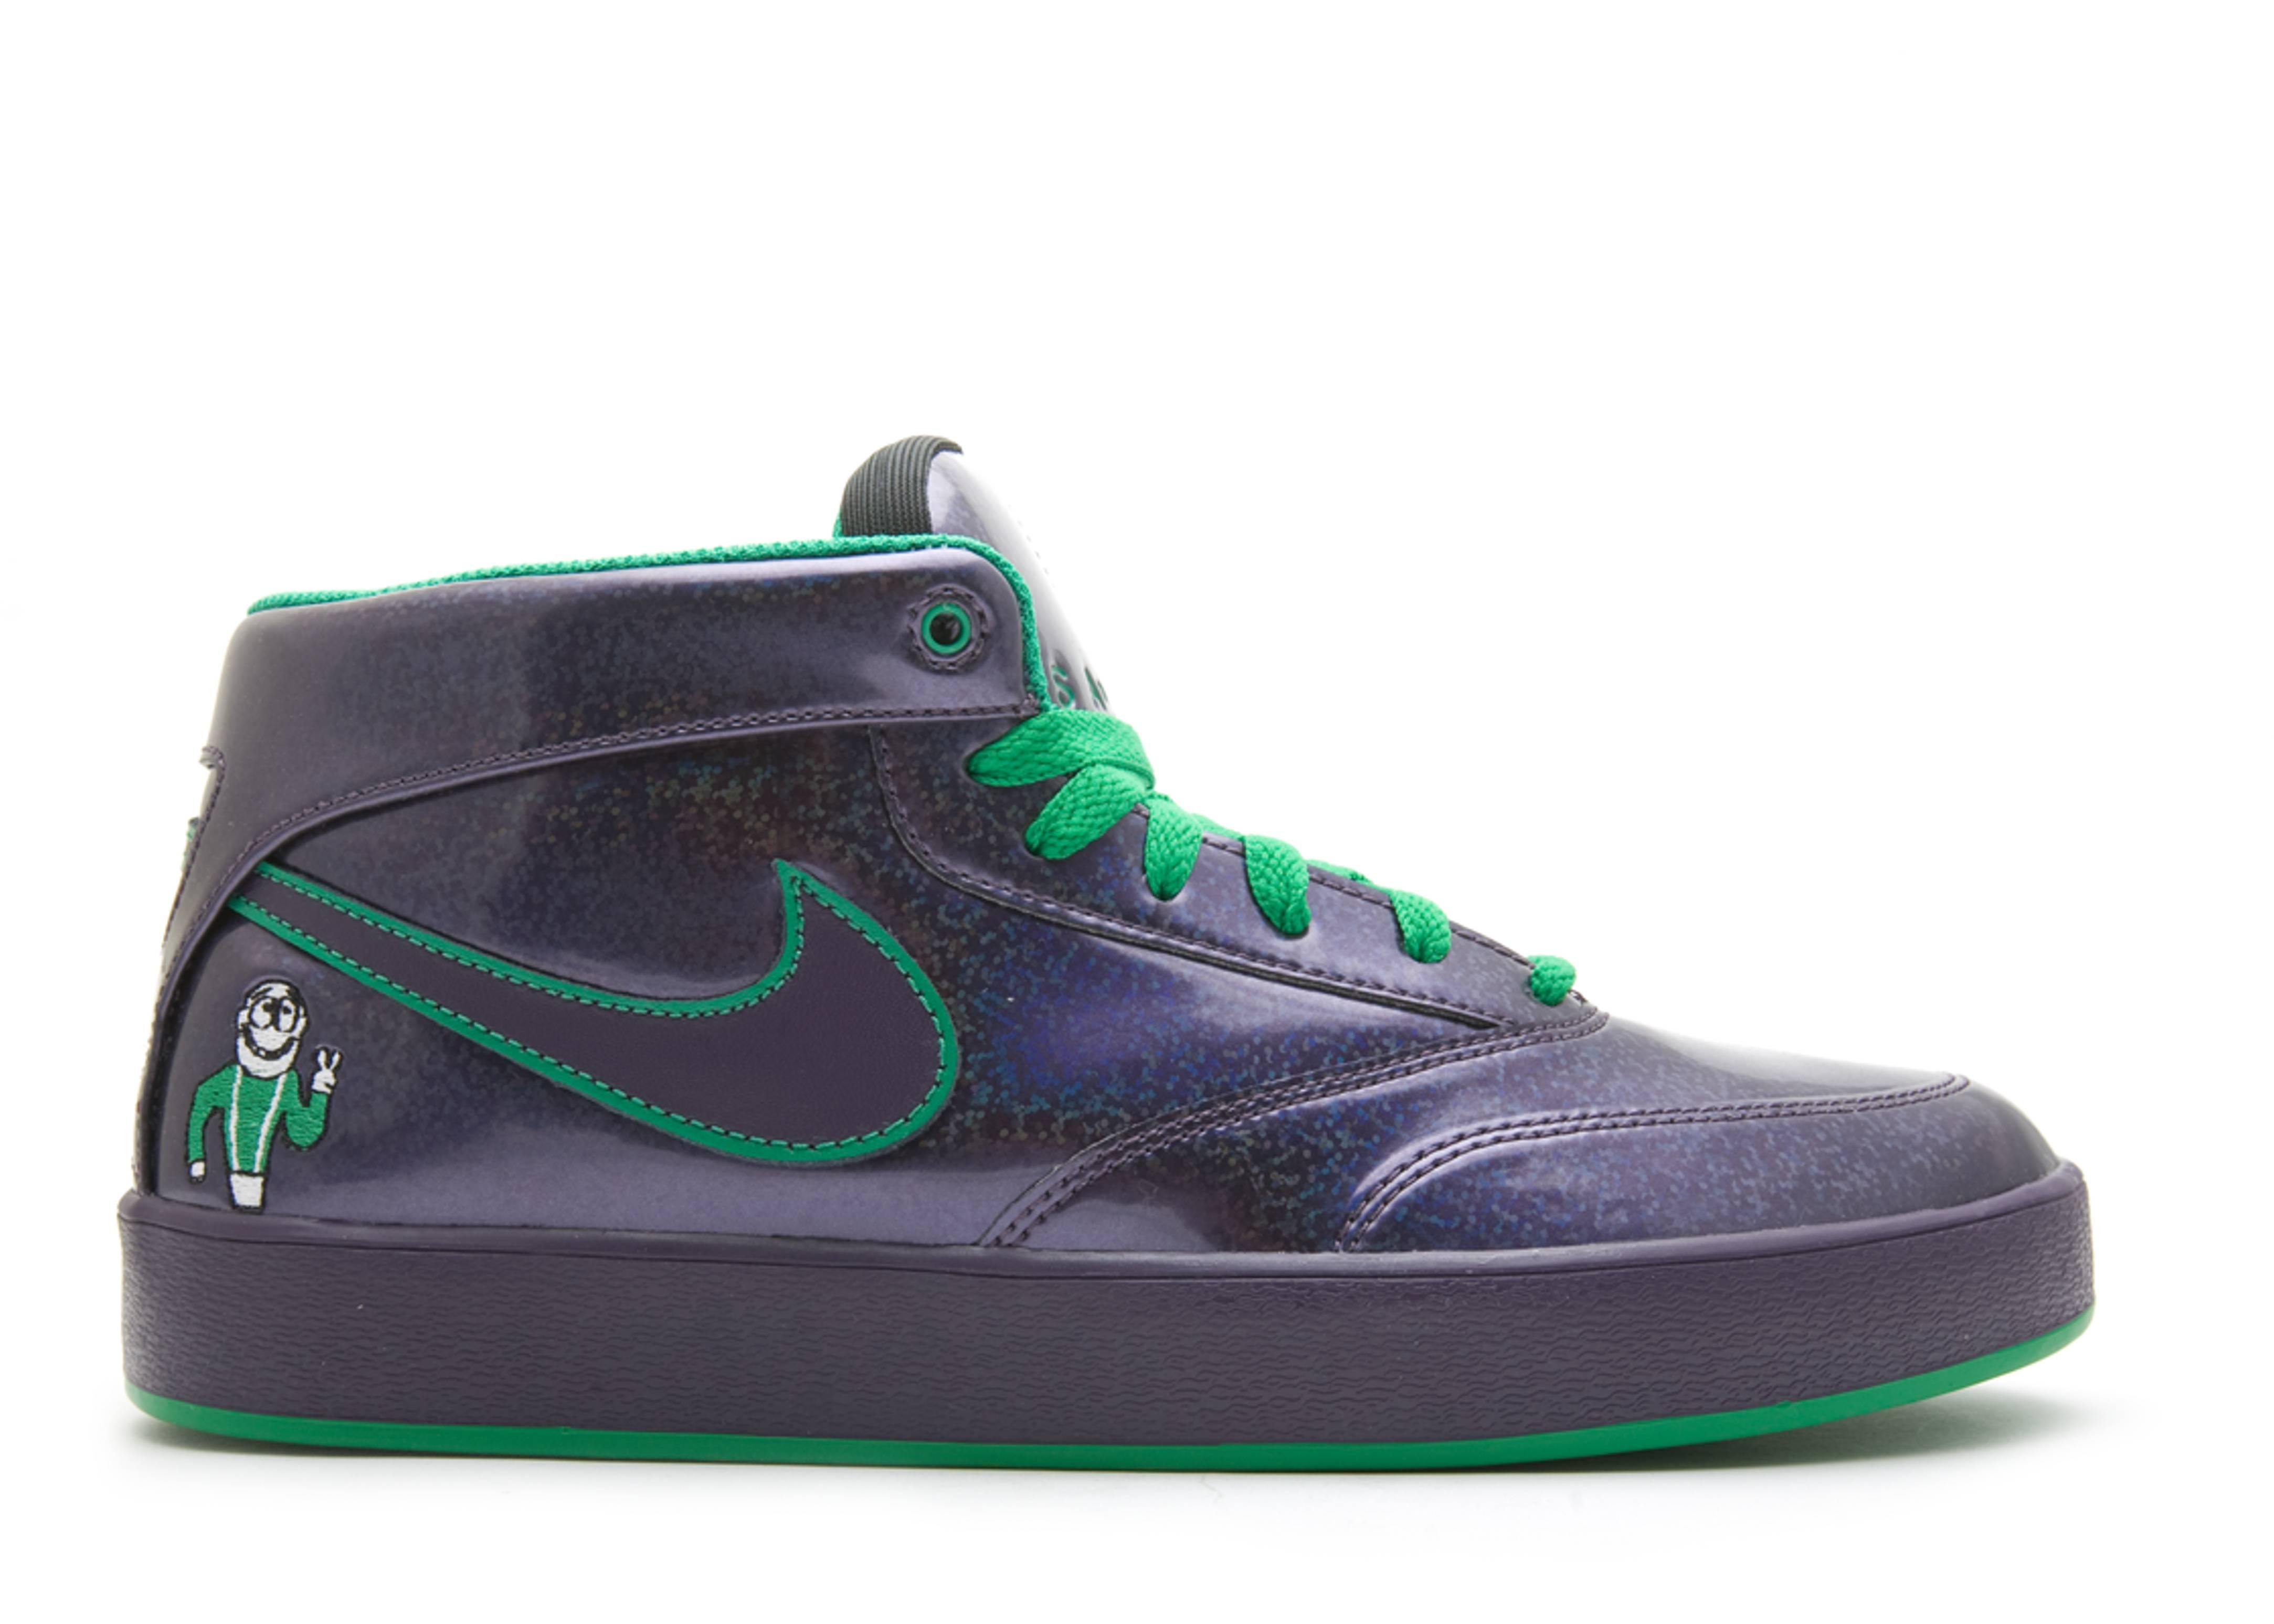 sports shoes 5c452 52f94 Zoom Omar Salazar